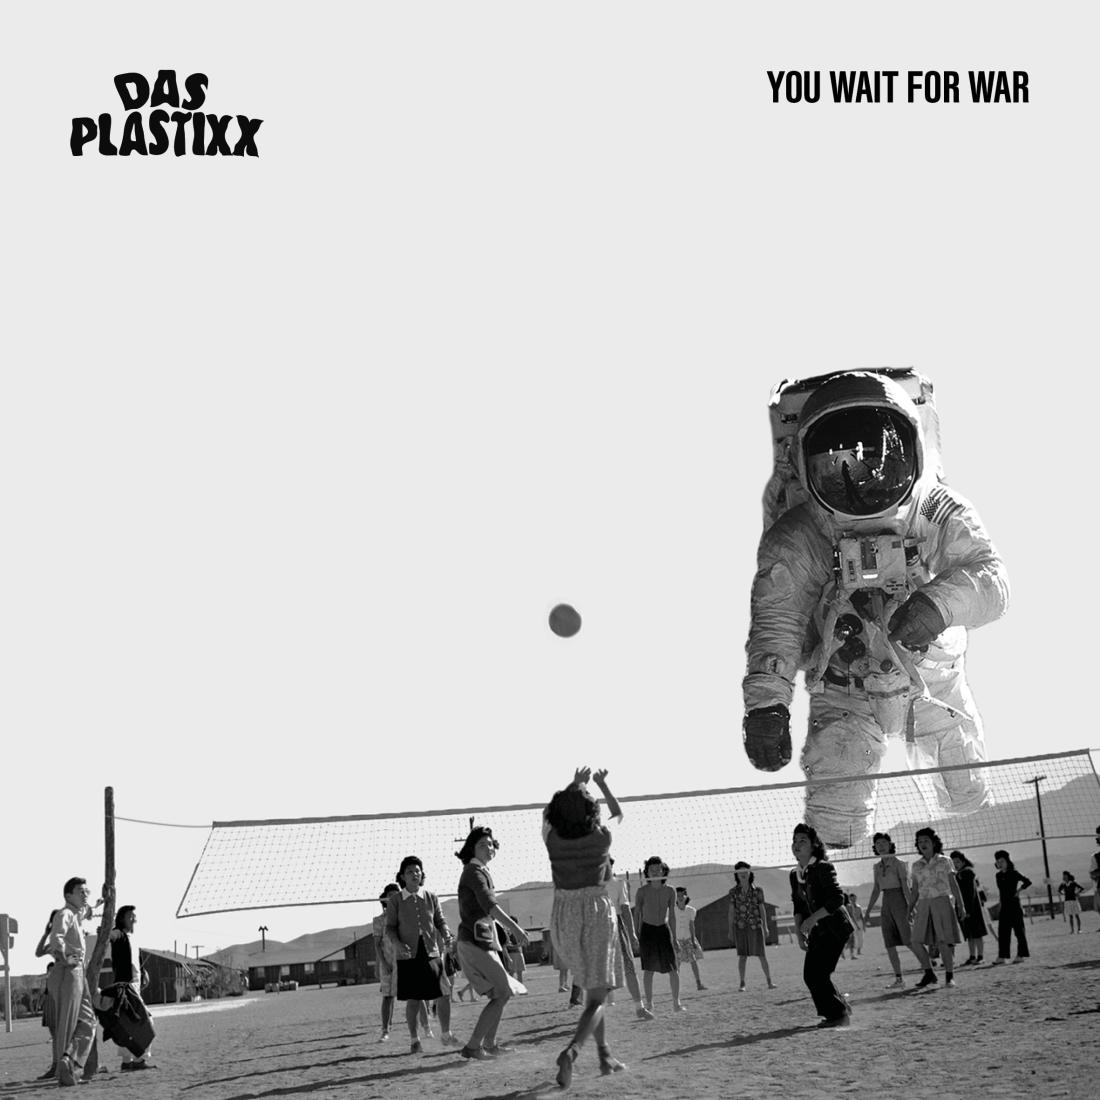 Das Plastixx 'You Wait For War' Album Artwork